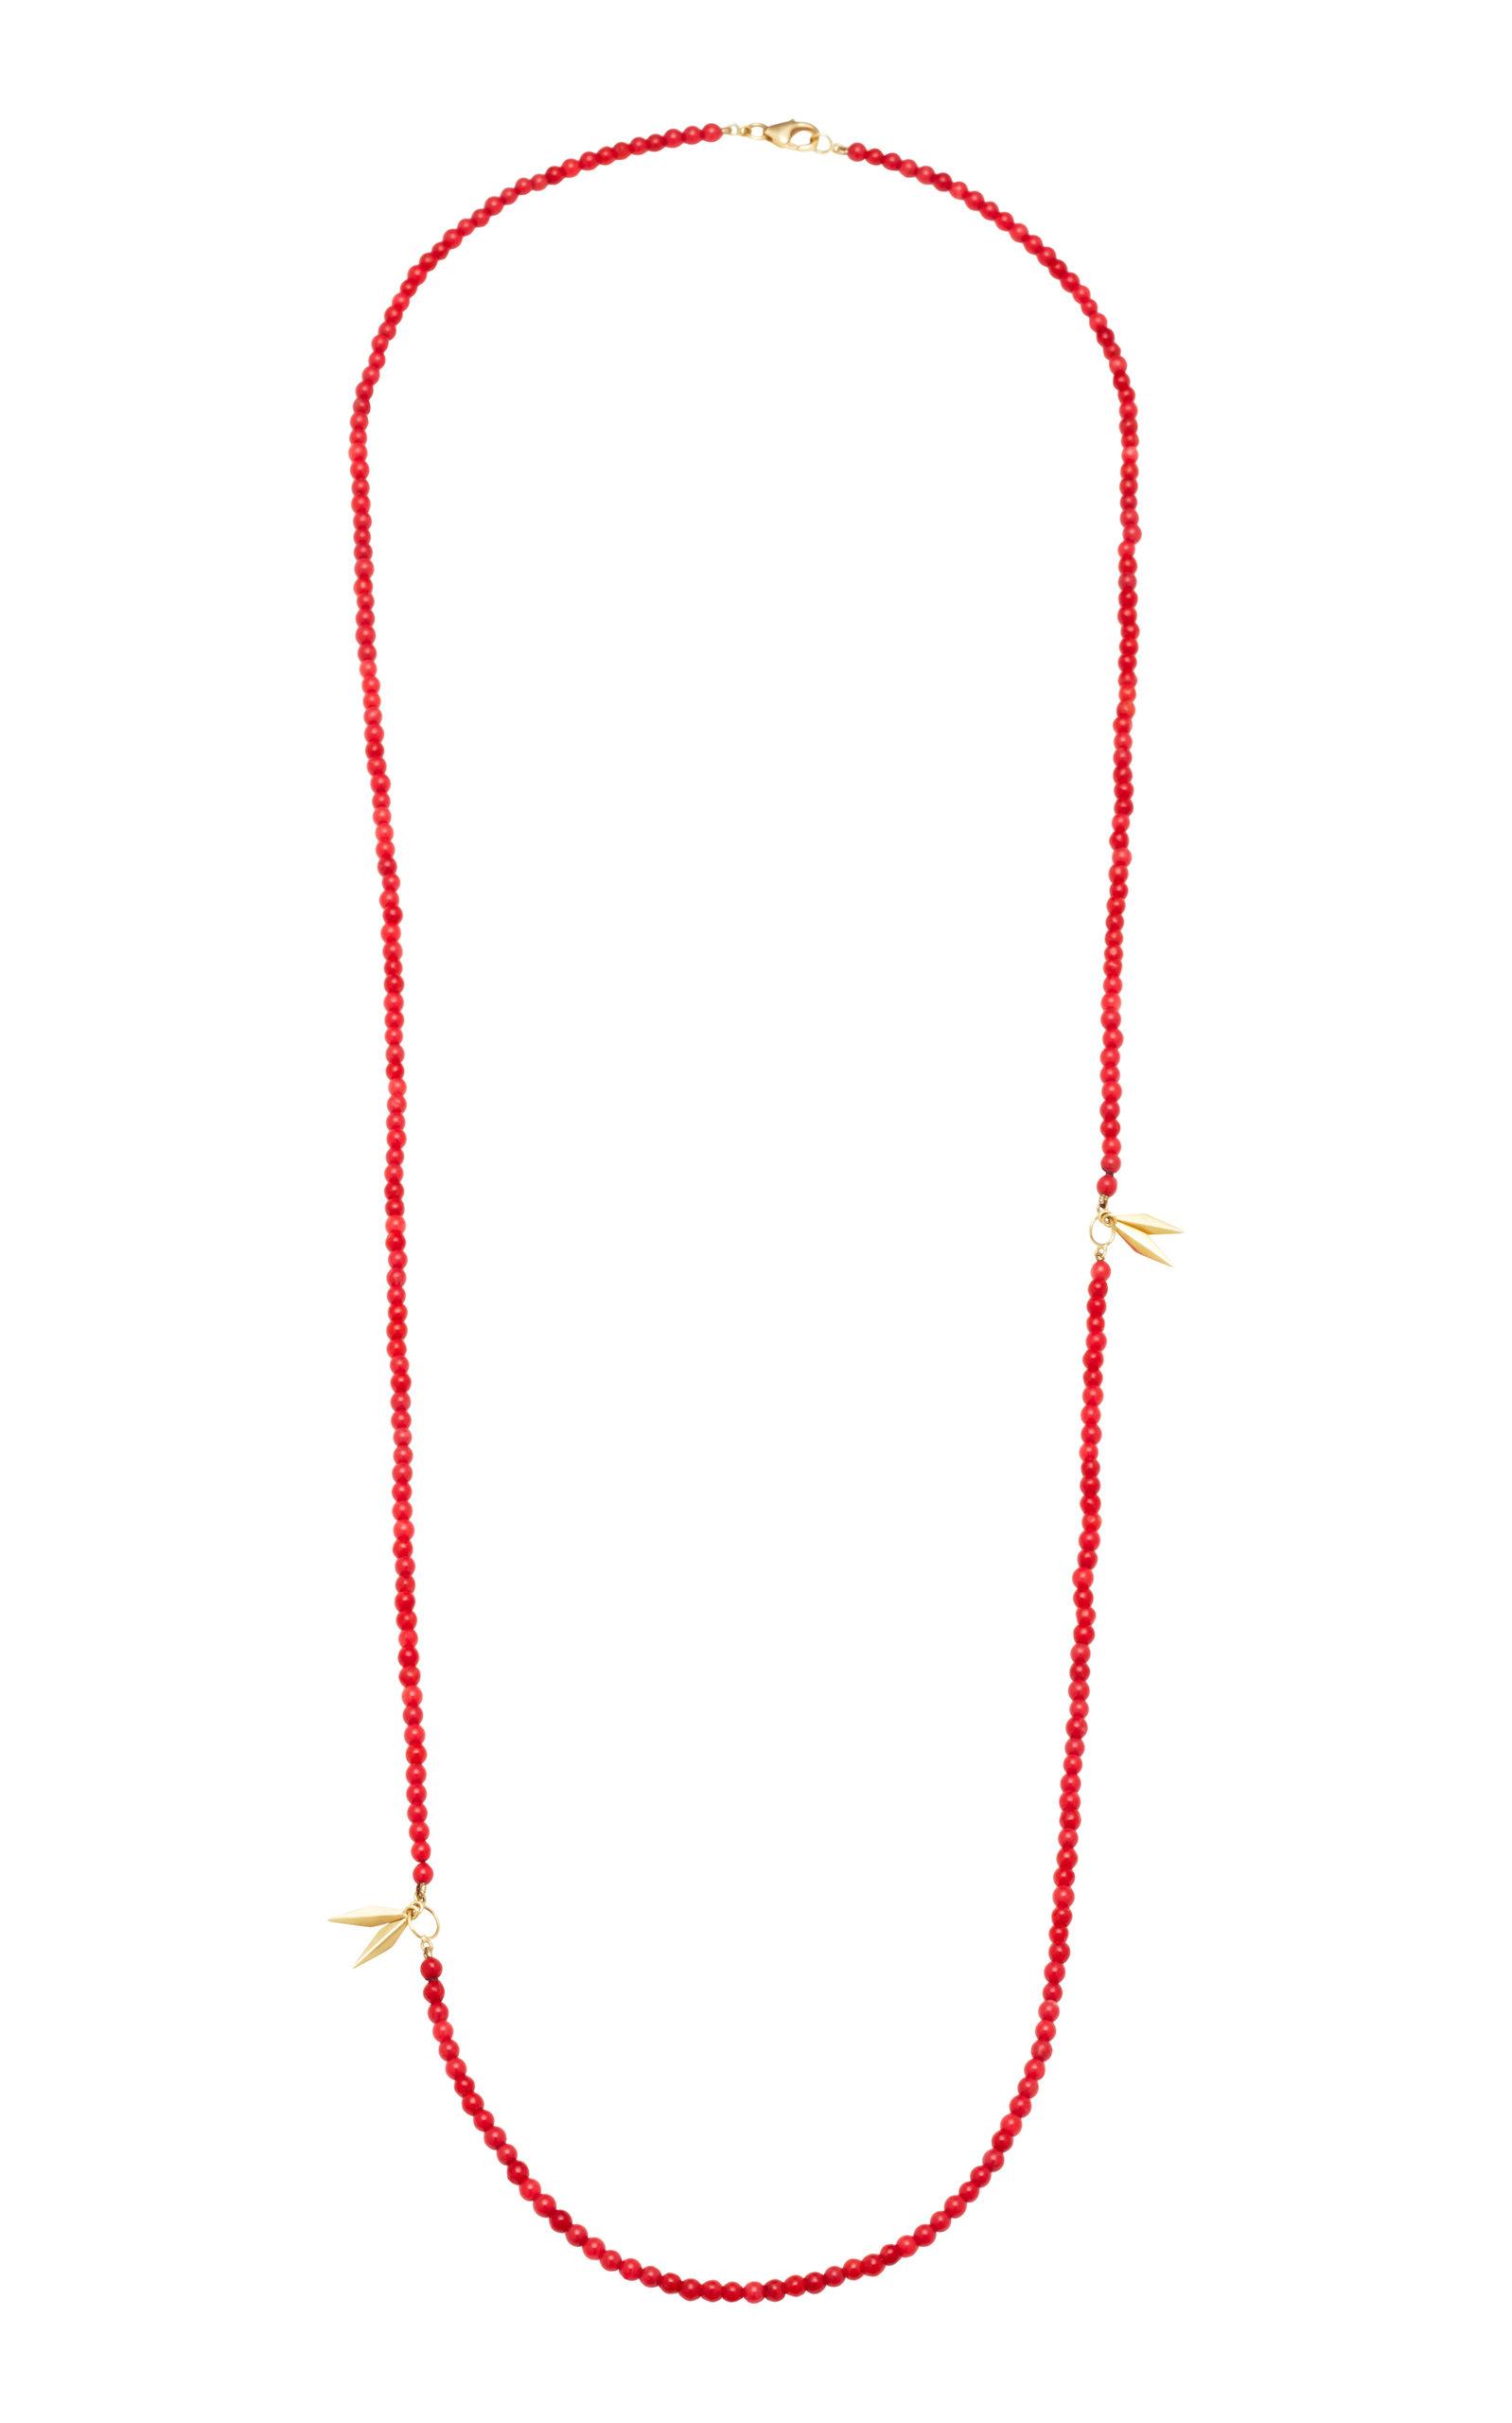 ARON & HIRSCH Karo 18K Gold Agate Necklace in Red